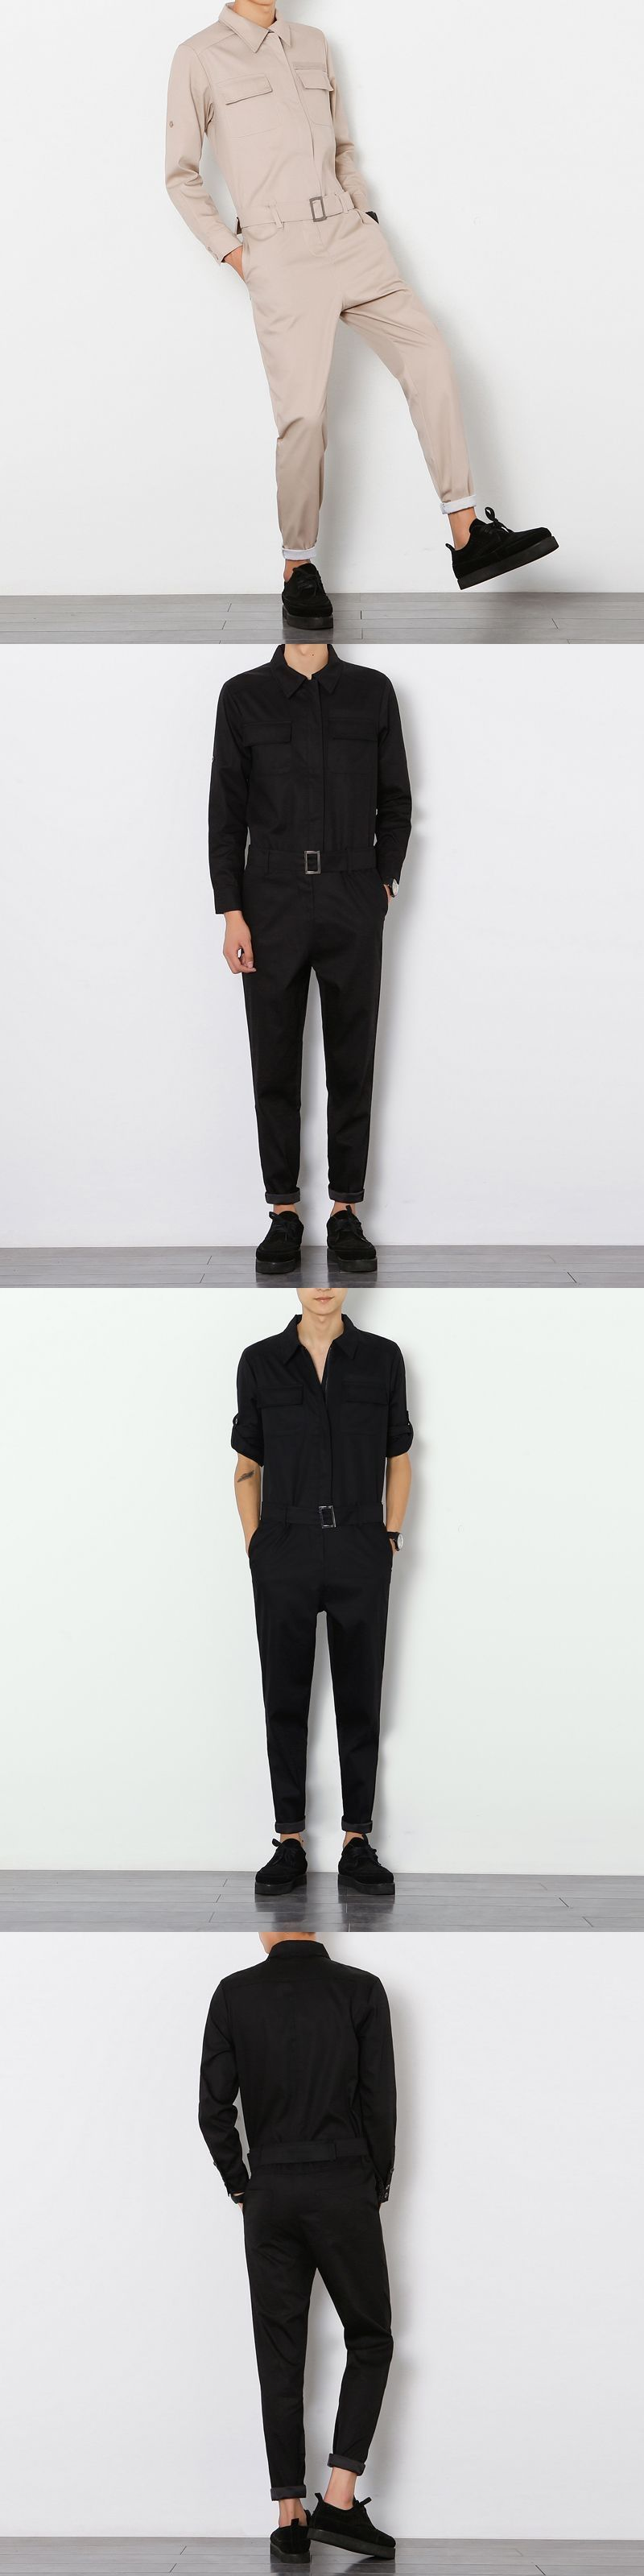 702a2e4ce291 2017 Harajuku Hiphop Cargo jumpsuits Men Streetwear jumpsuit Pants Male  Tooling Slim Trousers Casual loose bib